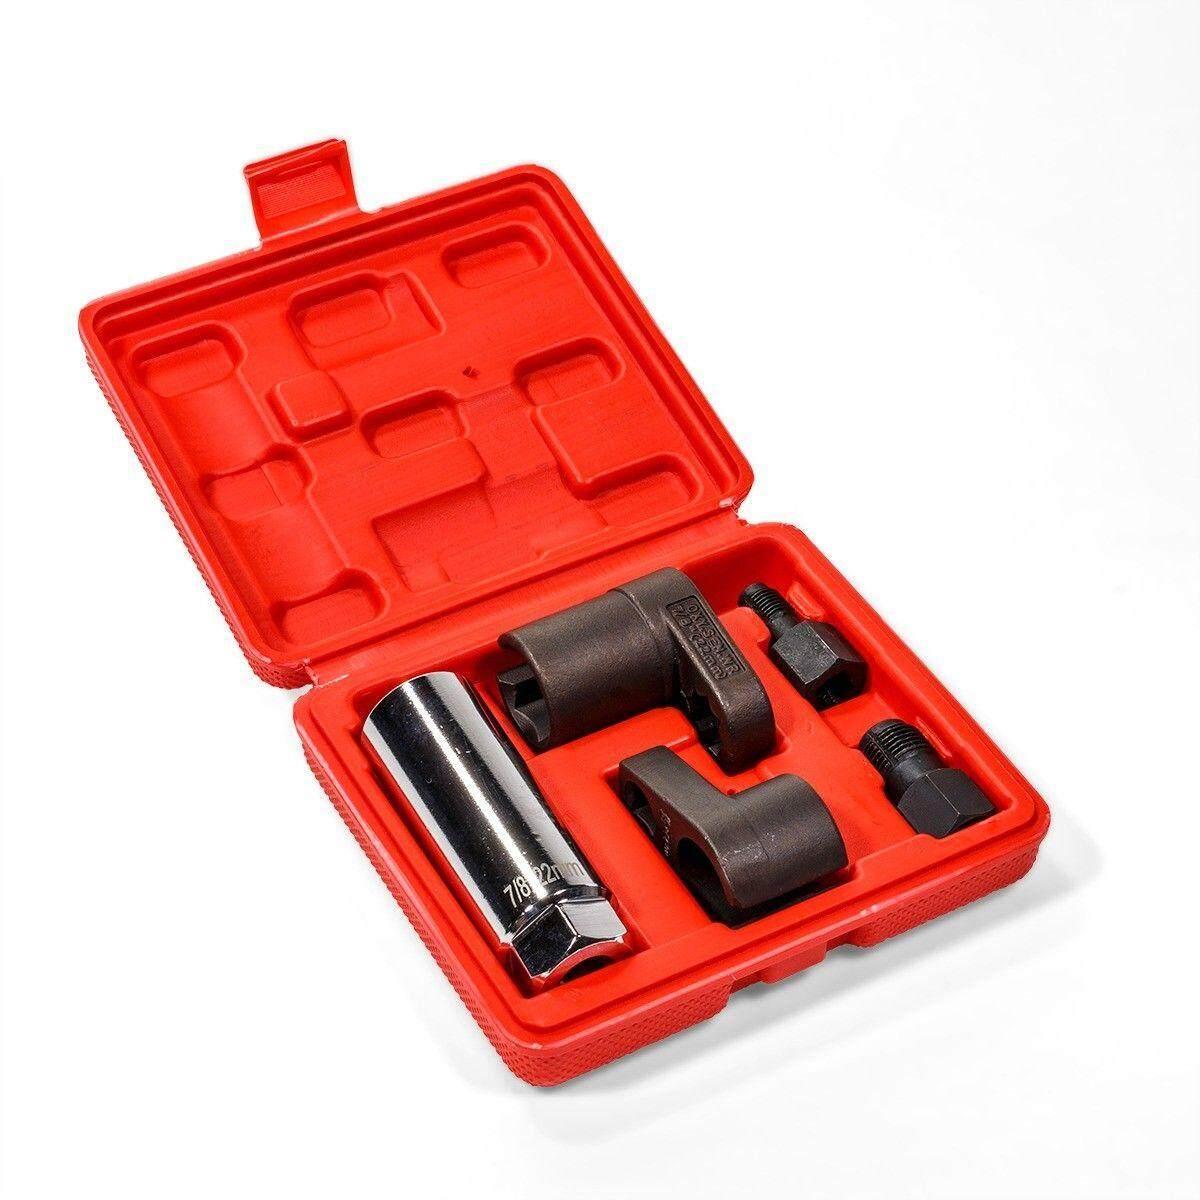 SK 5pcs/set O2 Oxygen Sensor Socket Thread Chaser Install Offset Wrench  Vacuum M12 M18 Models:5pcs/set